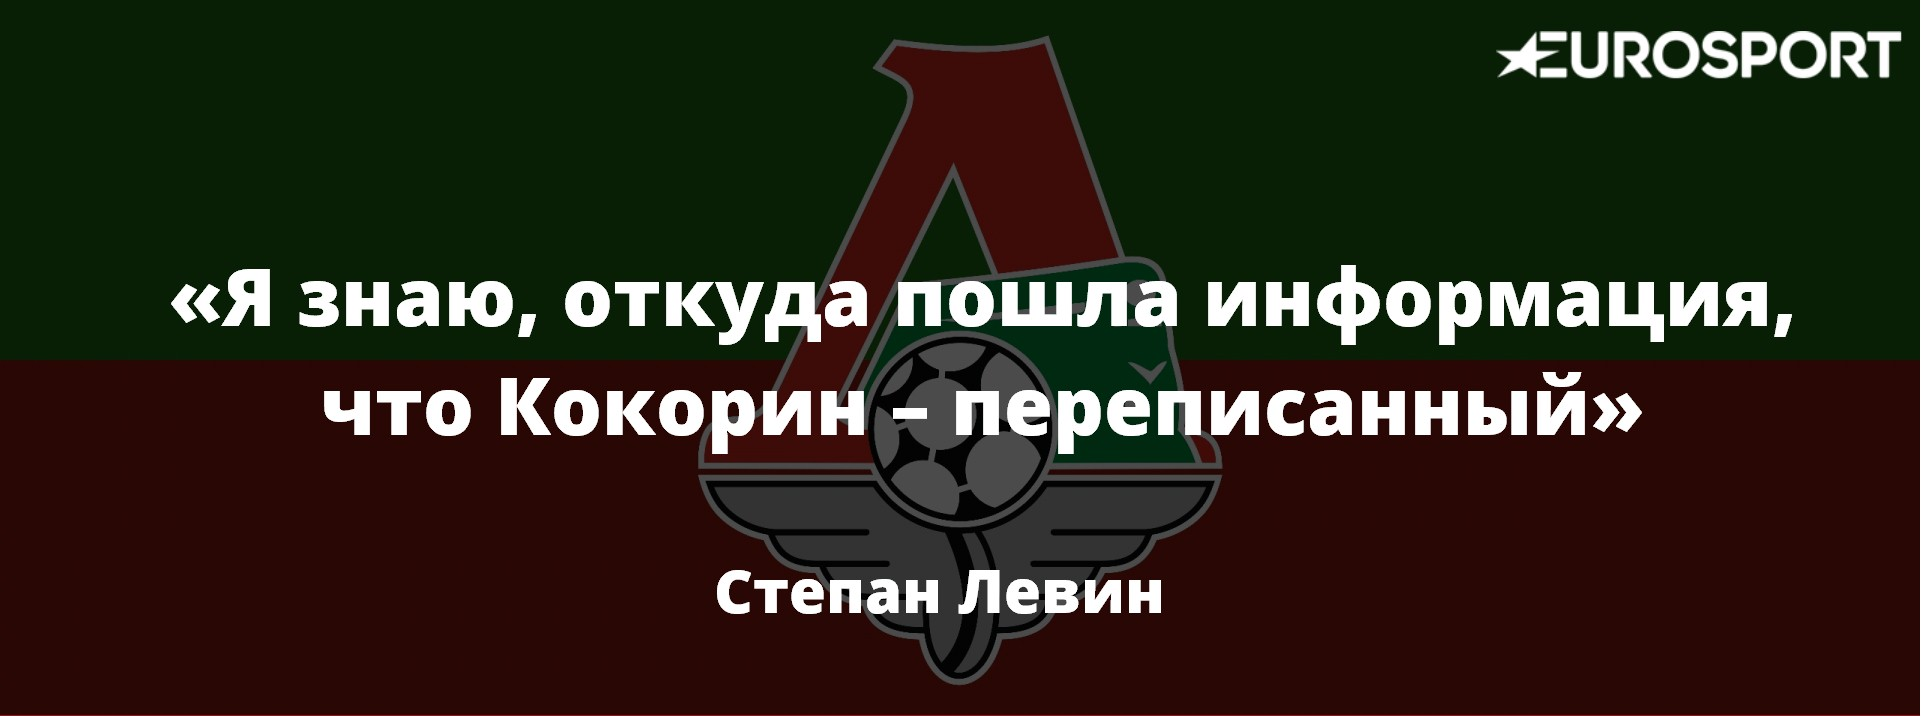 Степан Левин